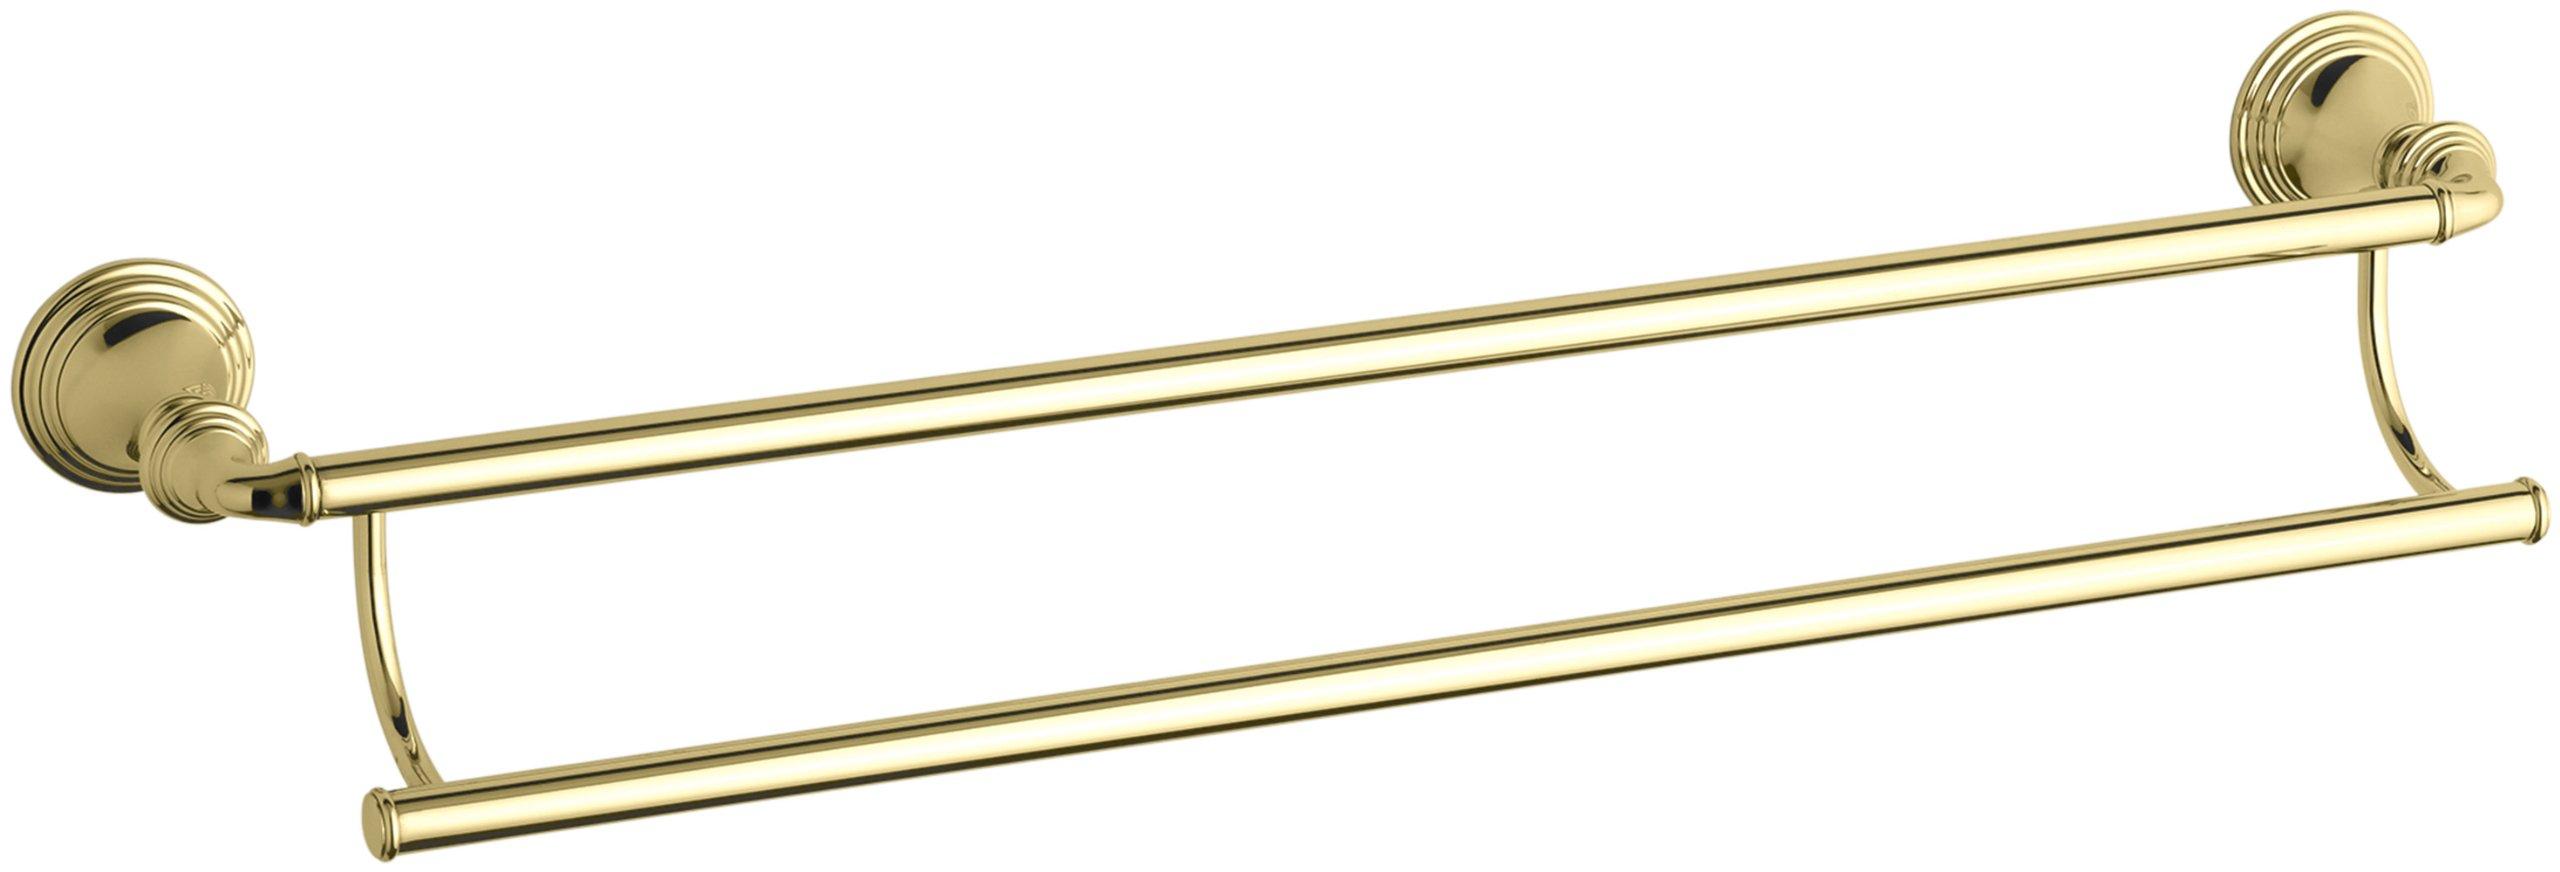 KOHLER K-10553-PB Devonshire 24-Inch Double Towel Bar, Vibrant Polished Brass